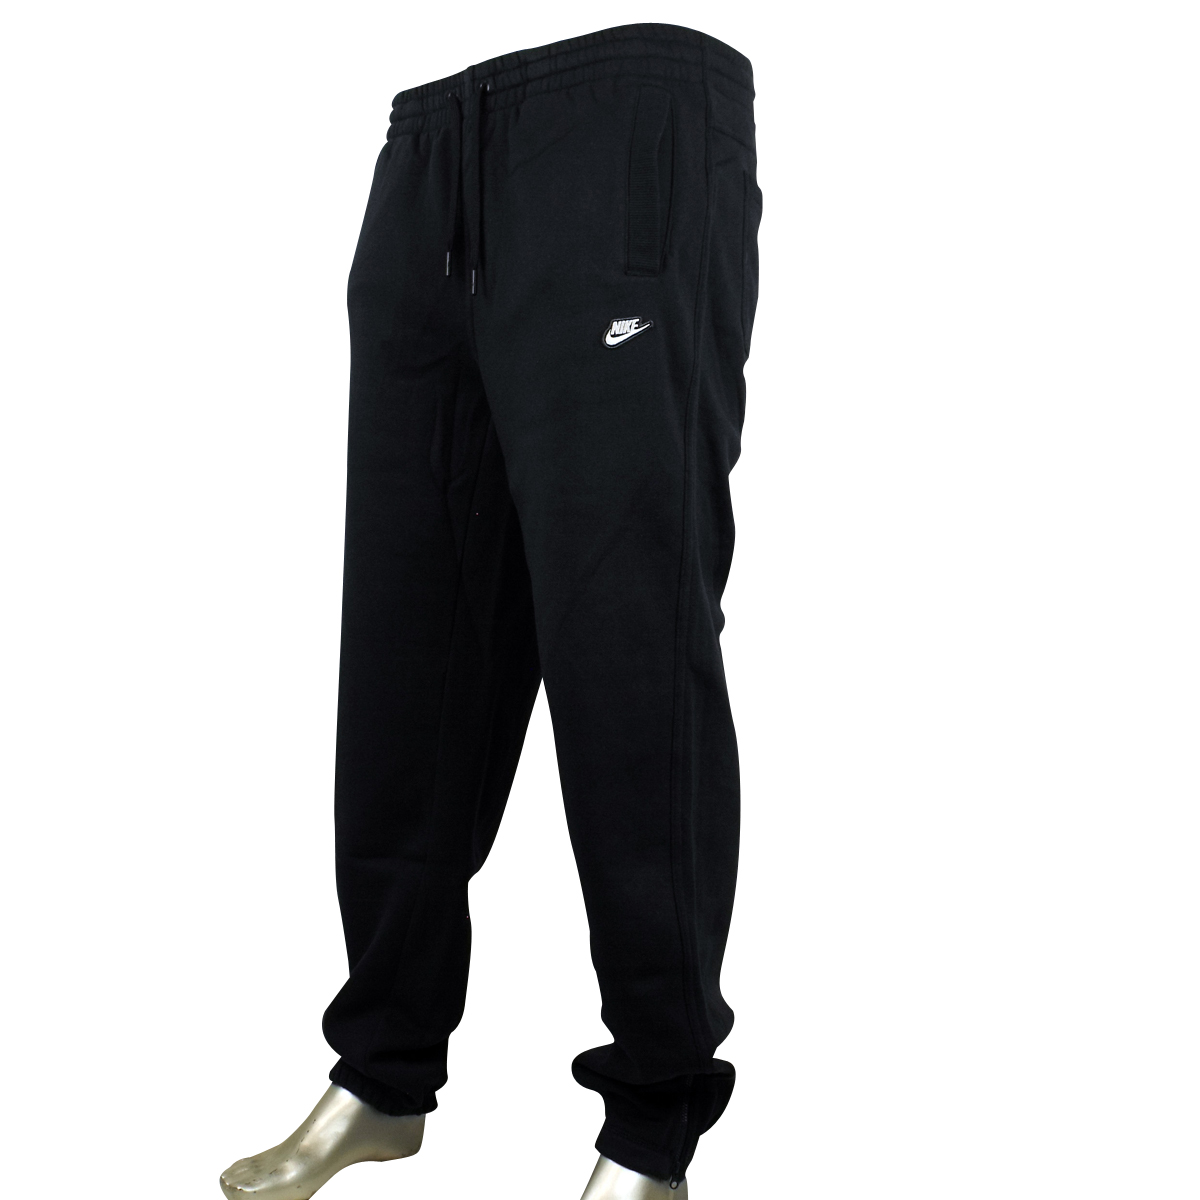 23 luxury Nike Jogging Pants Womens – playzoa.com